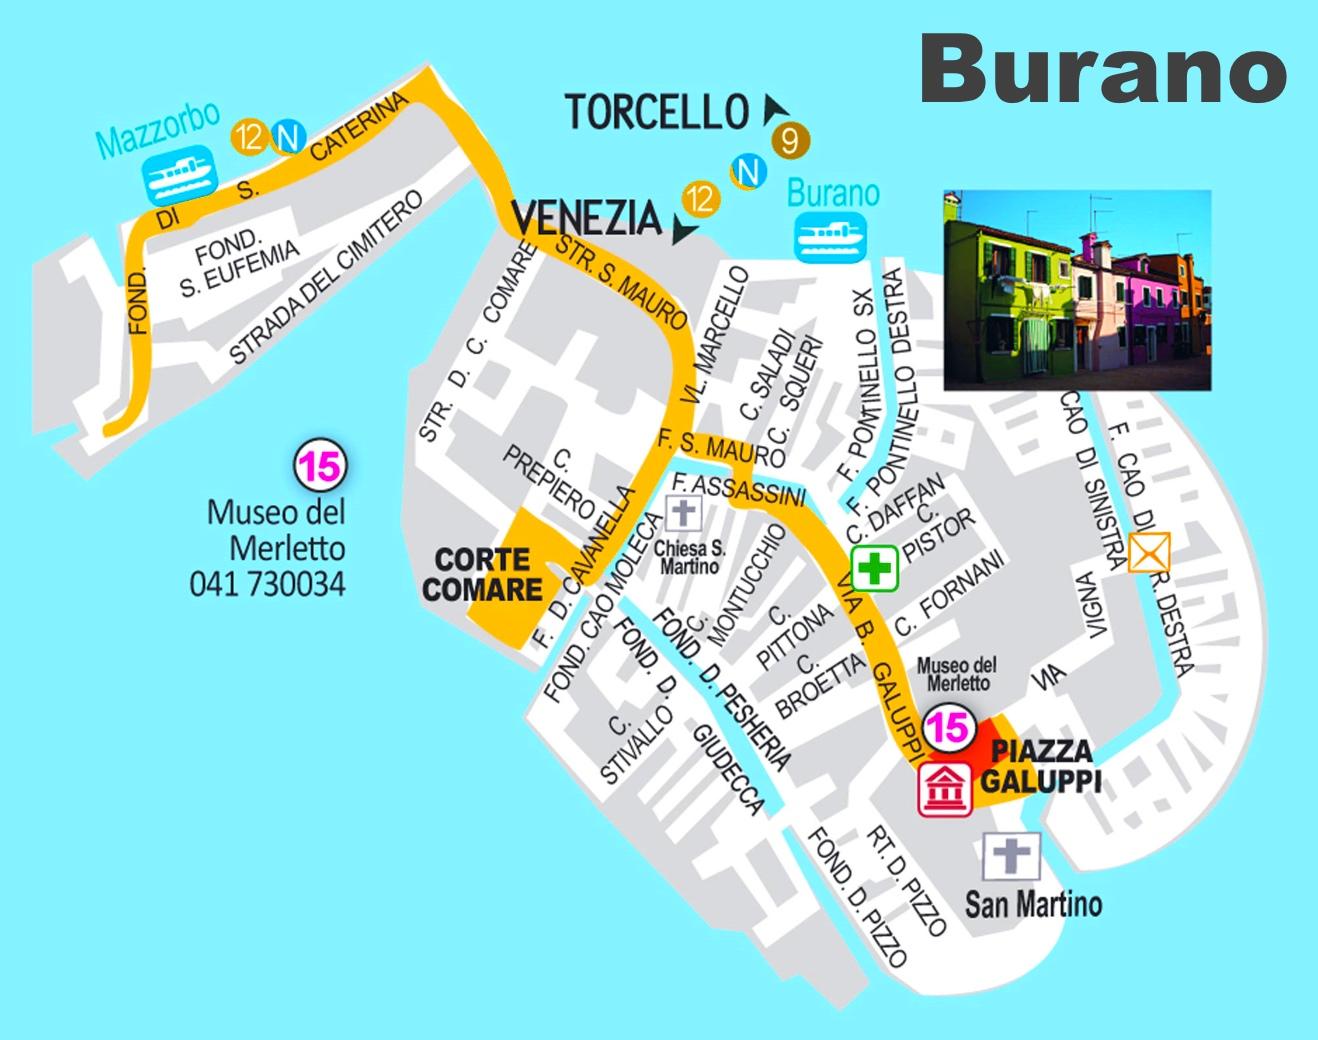 Cartina Turistica Di Venezia.Burano Mappa Turistica